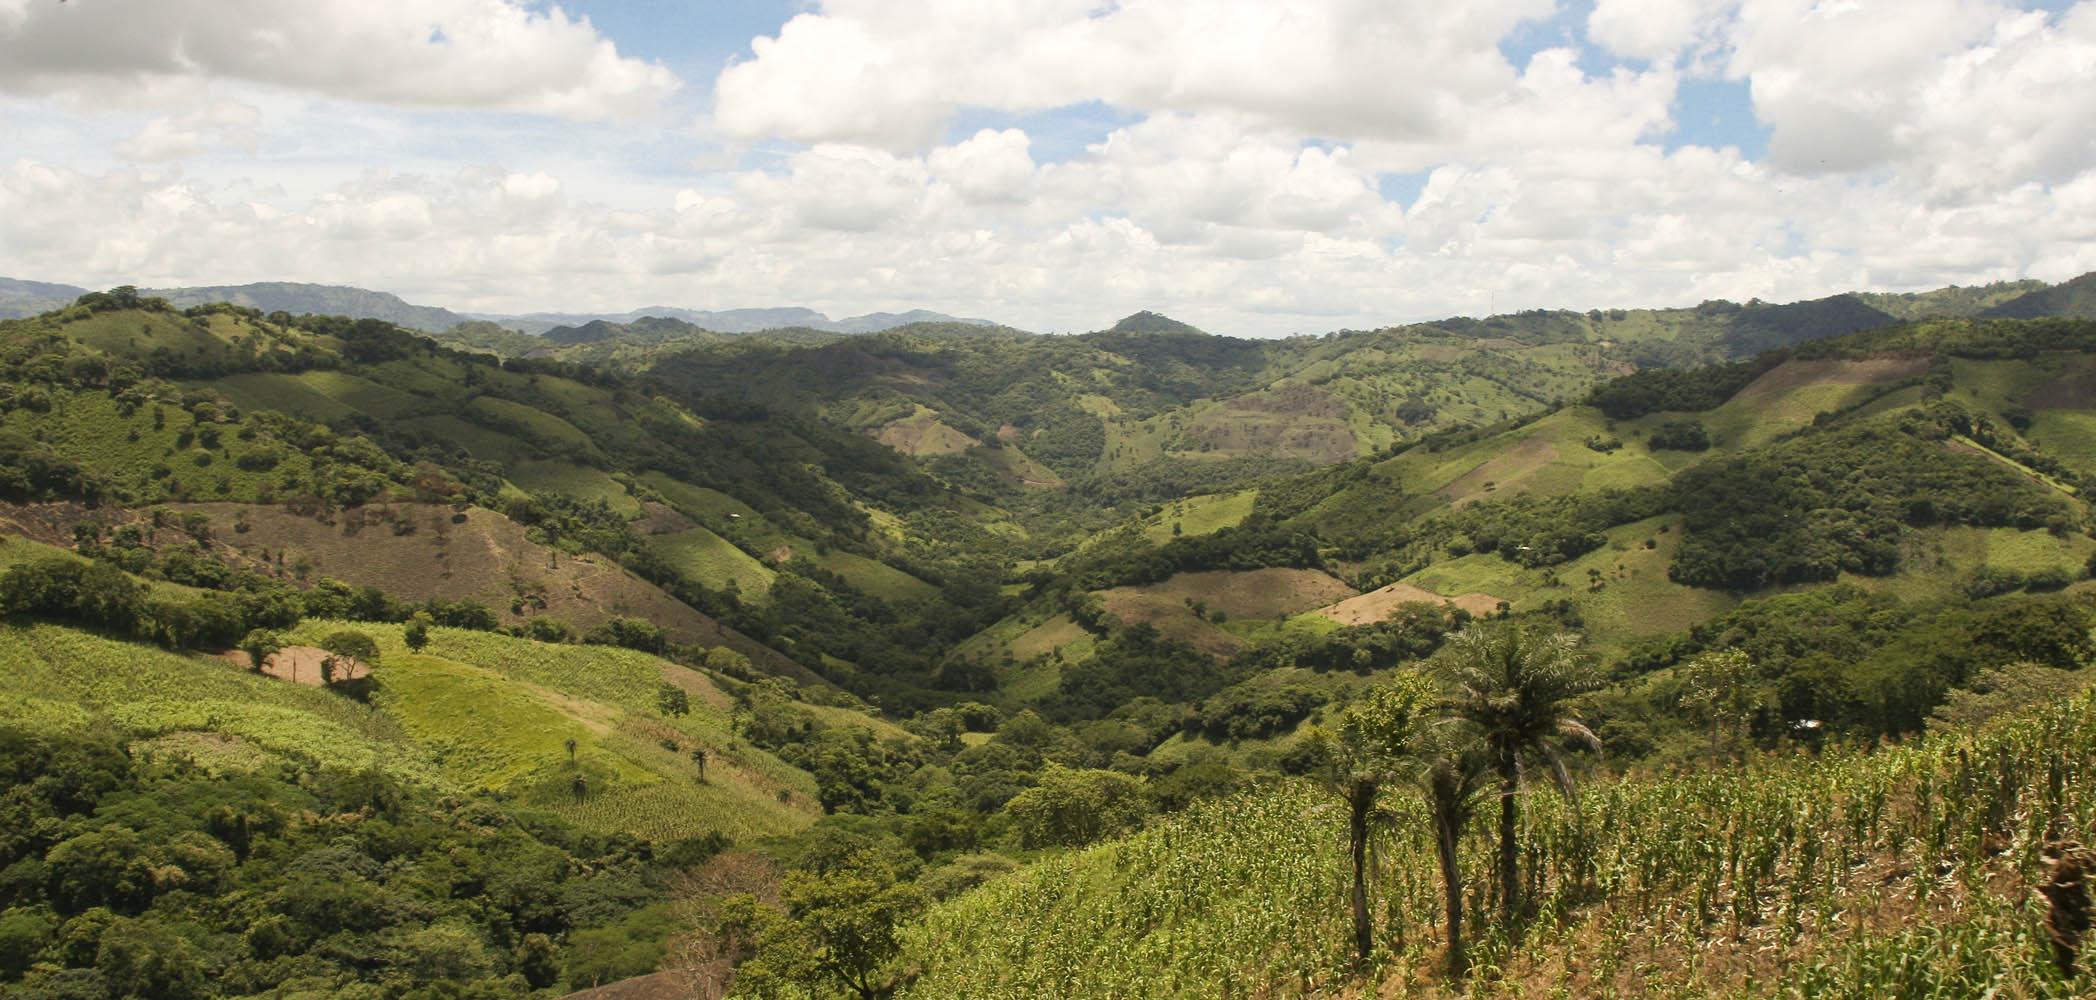 Région de Somoto